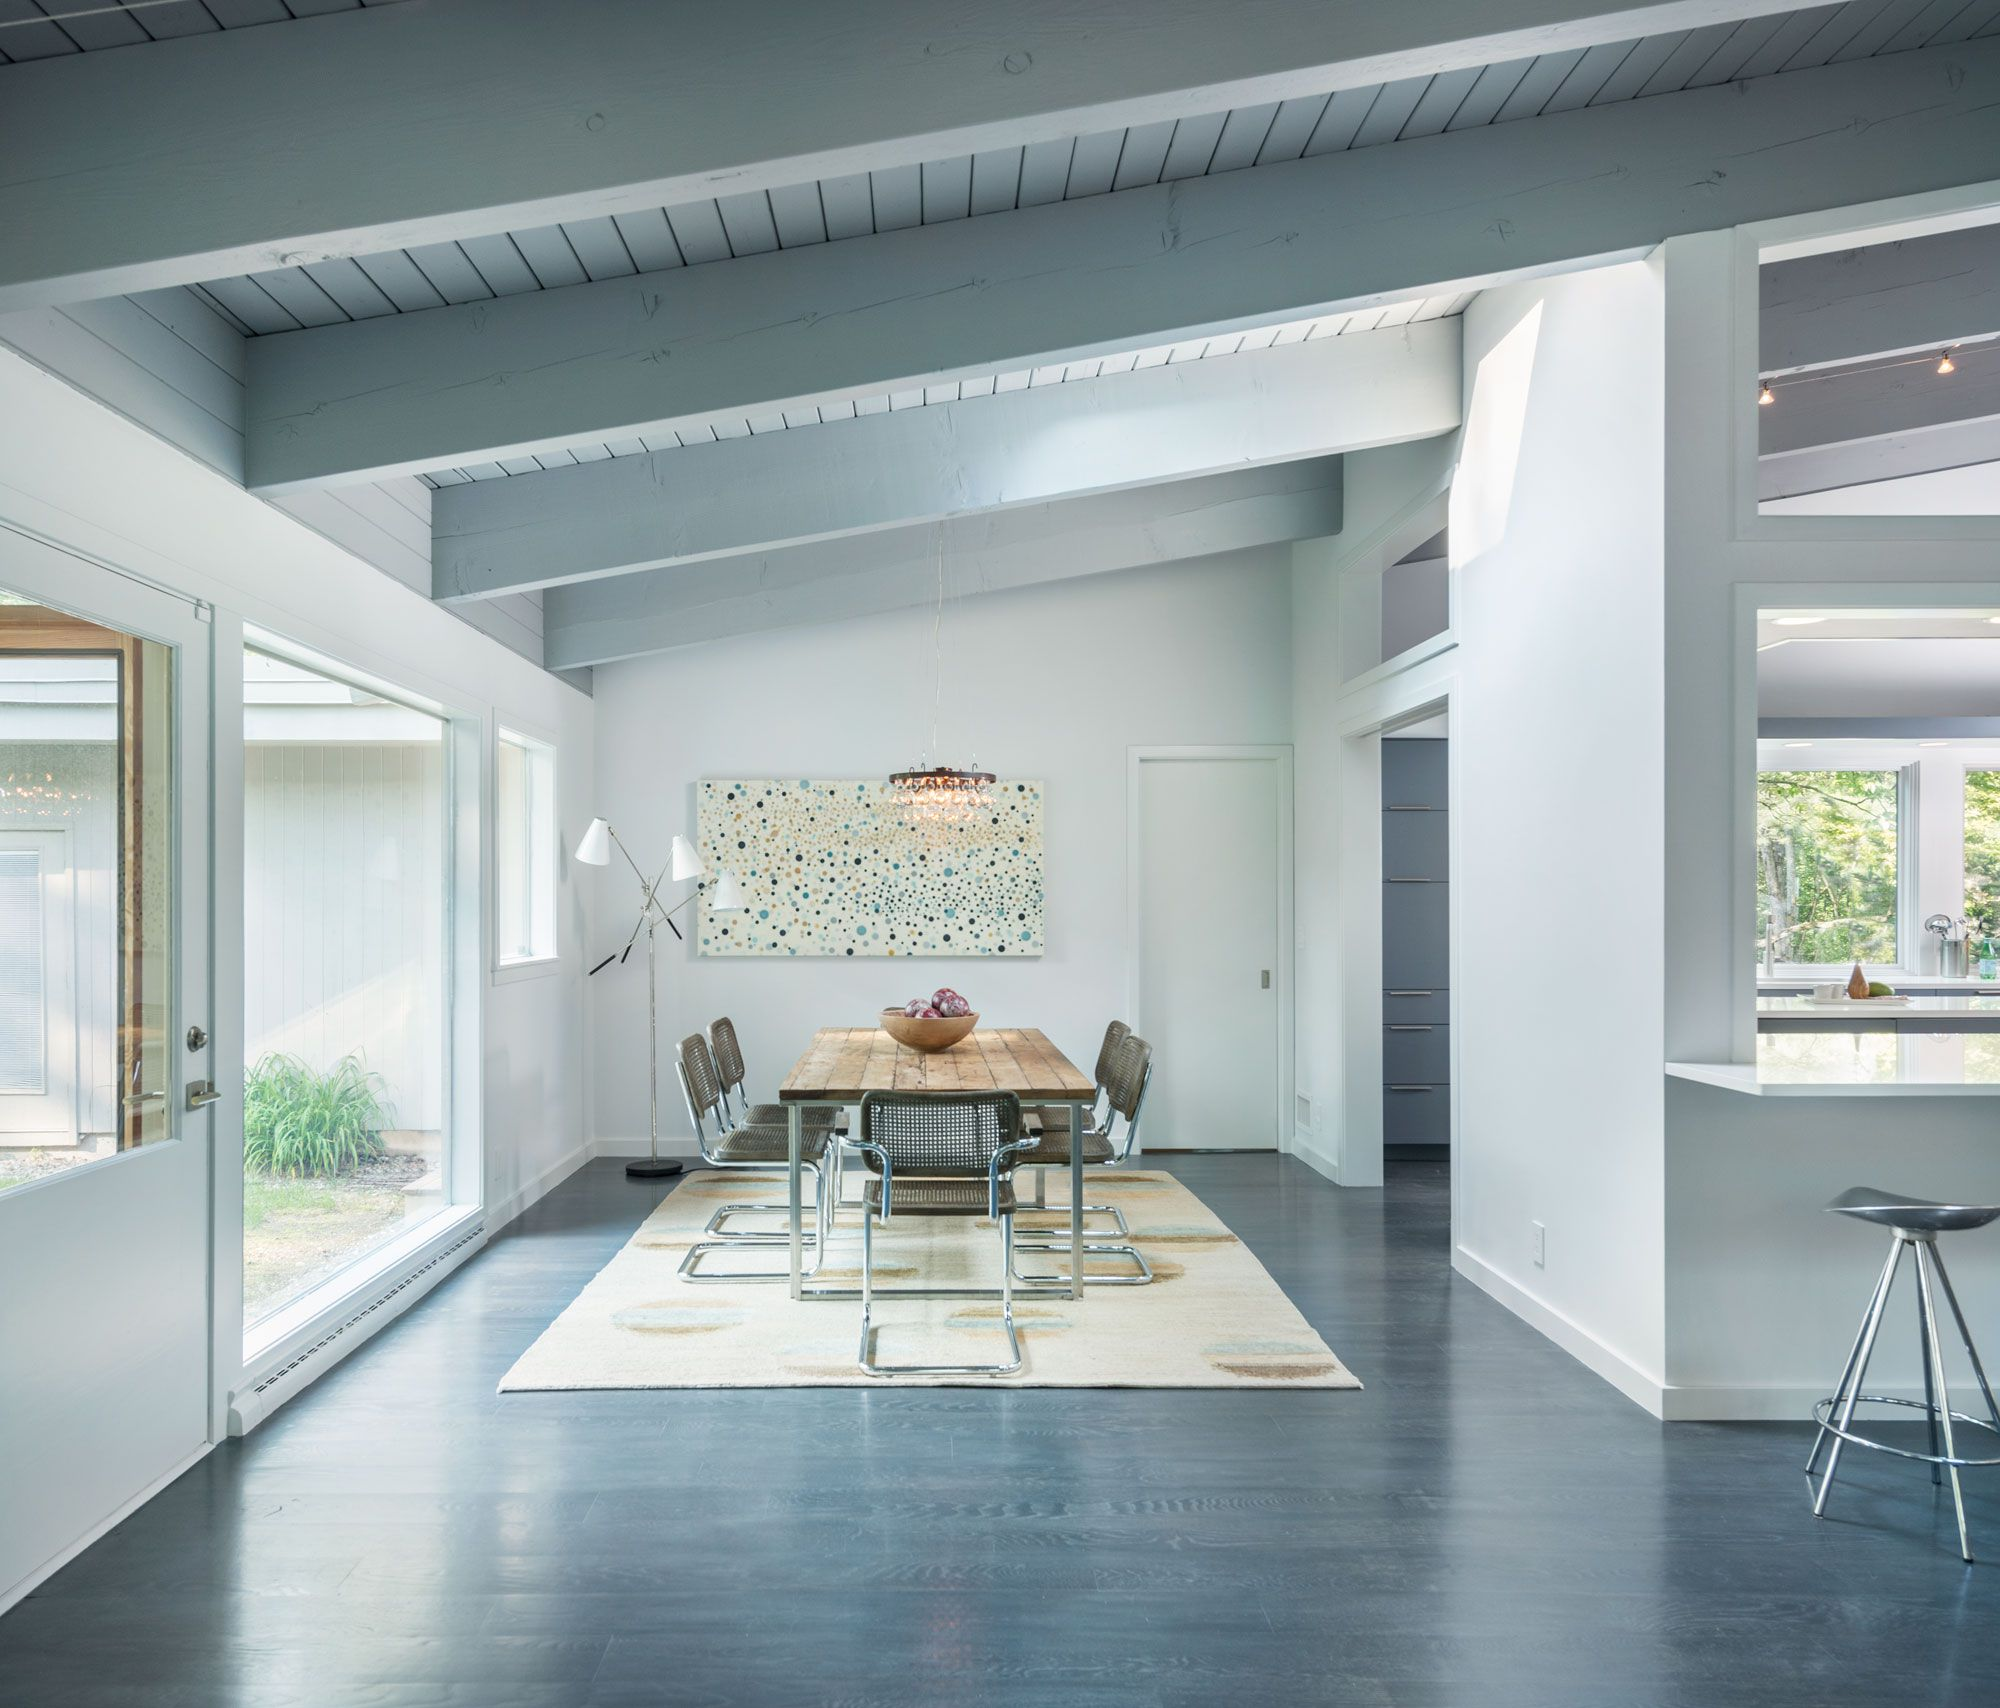 Mid Century Modern Home Designs: Mid-Century Modern Home Design By Flavin Architects